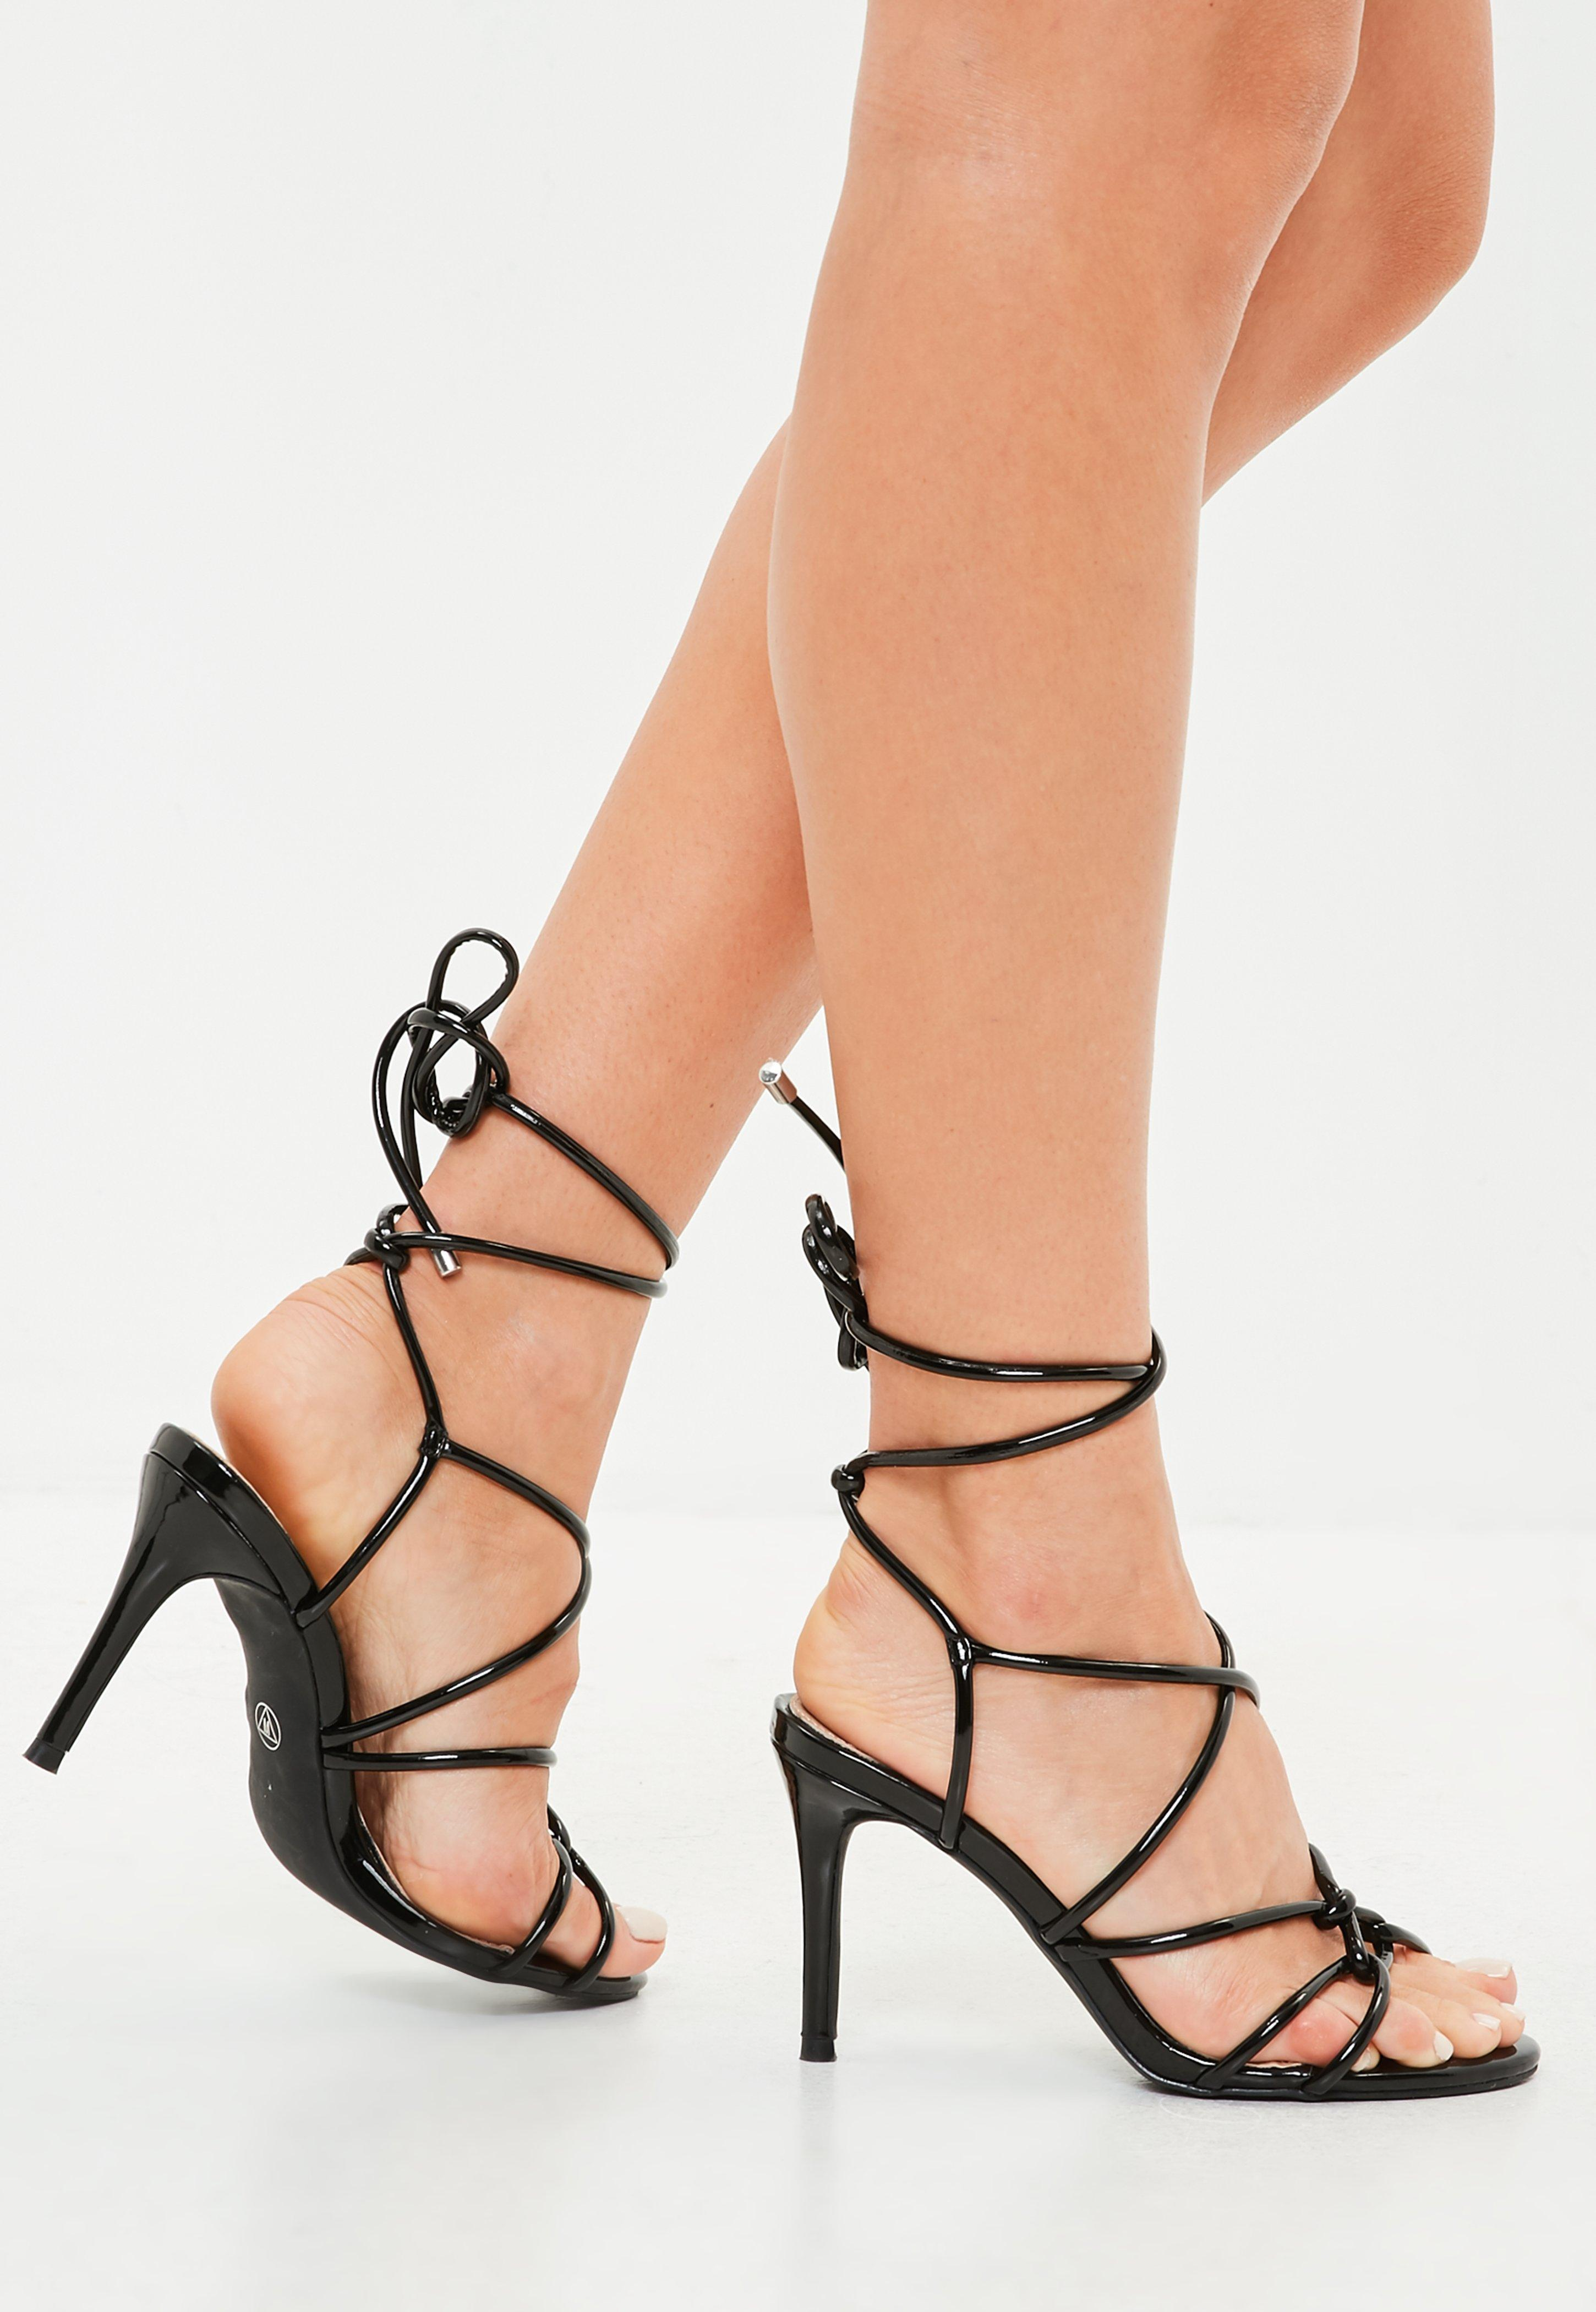 e90b4f00a357 Lyst - Missguided Black Multi Strap Gladiator Mid Heel Sandals in Black